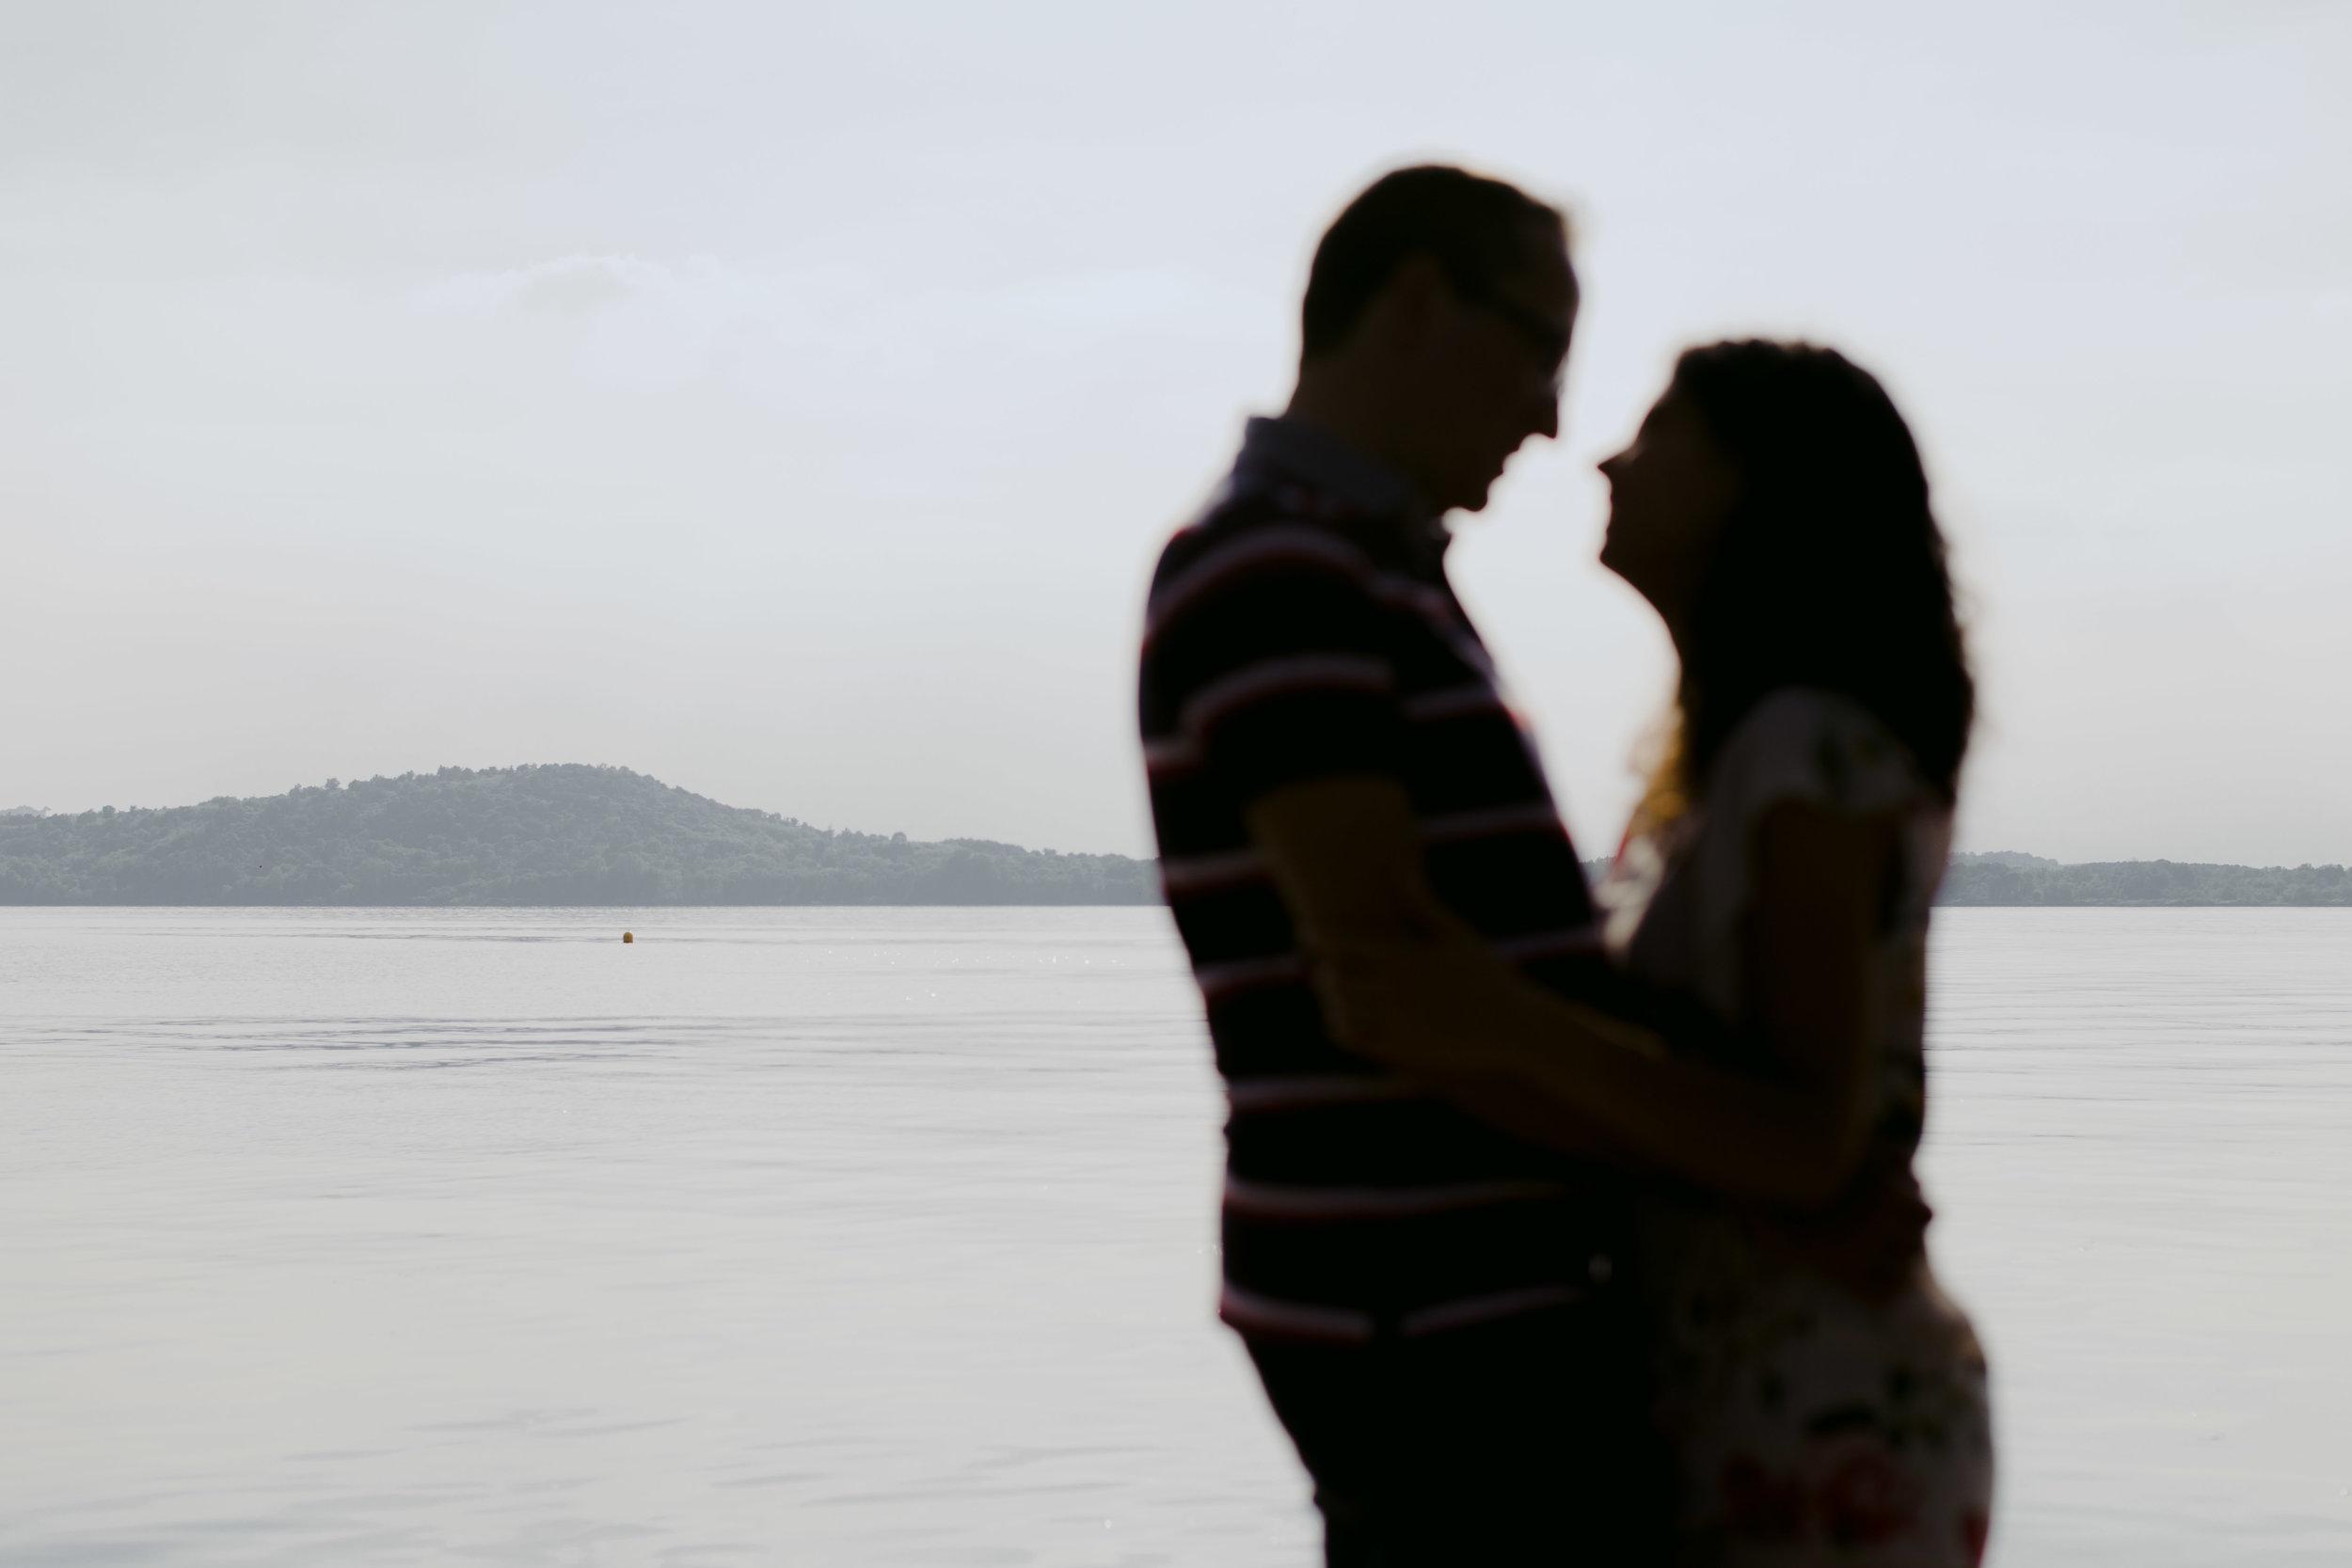 052 - Alessia + Stefano-4.JPG